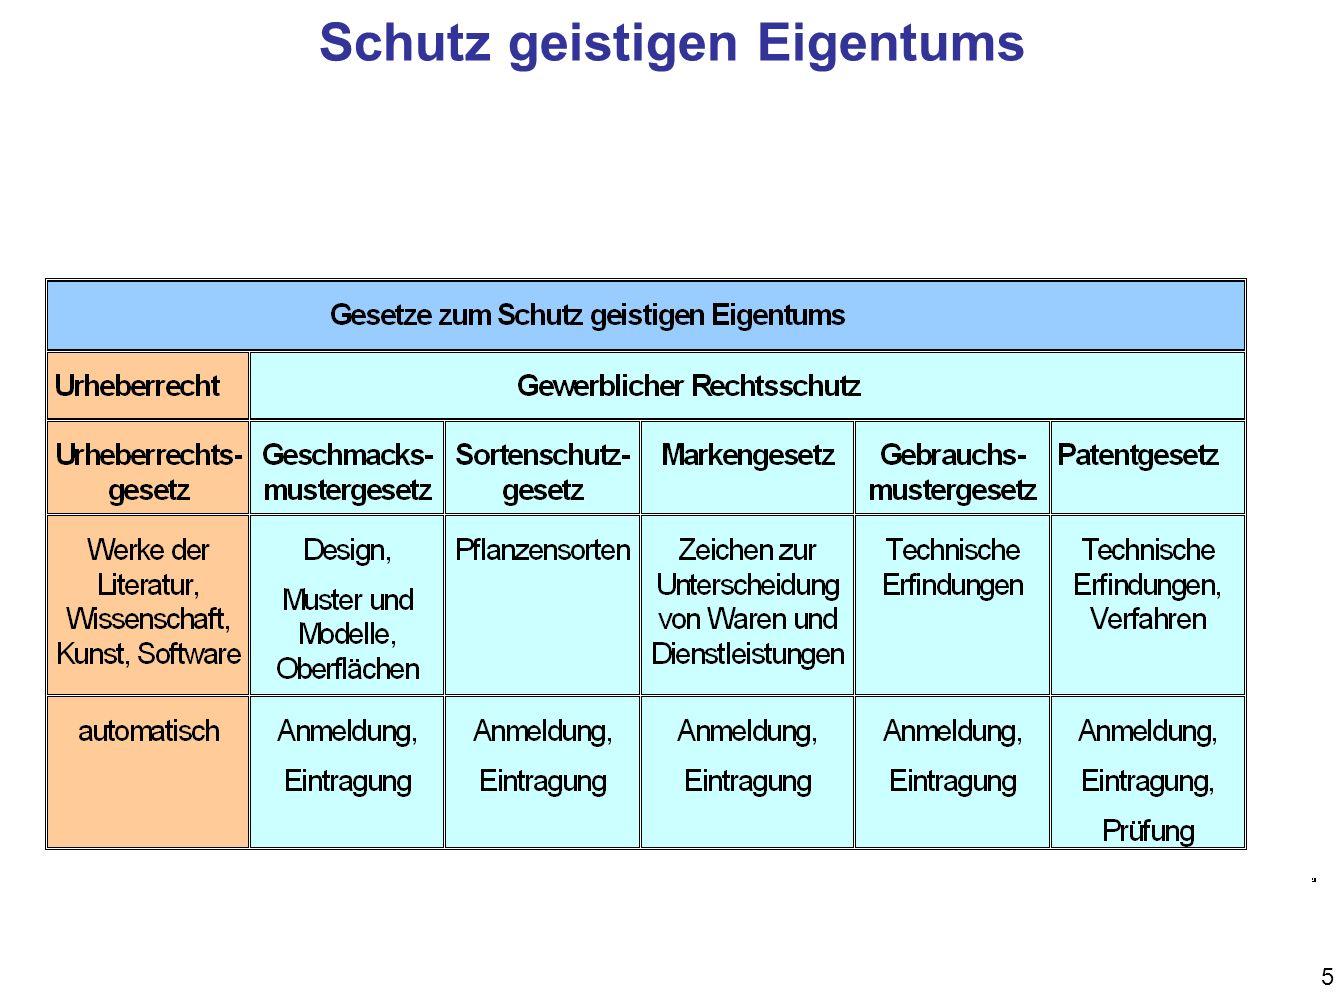 16 Europäische Patentschrift